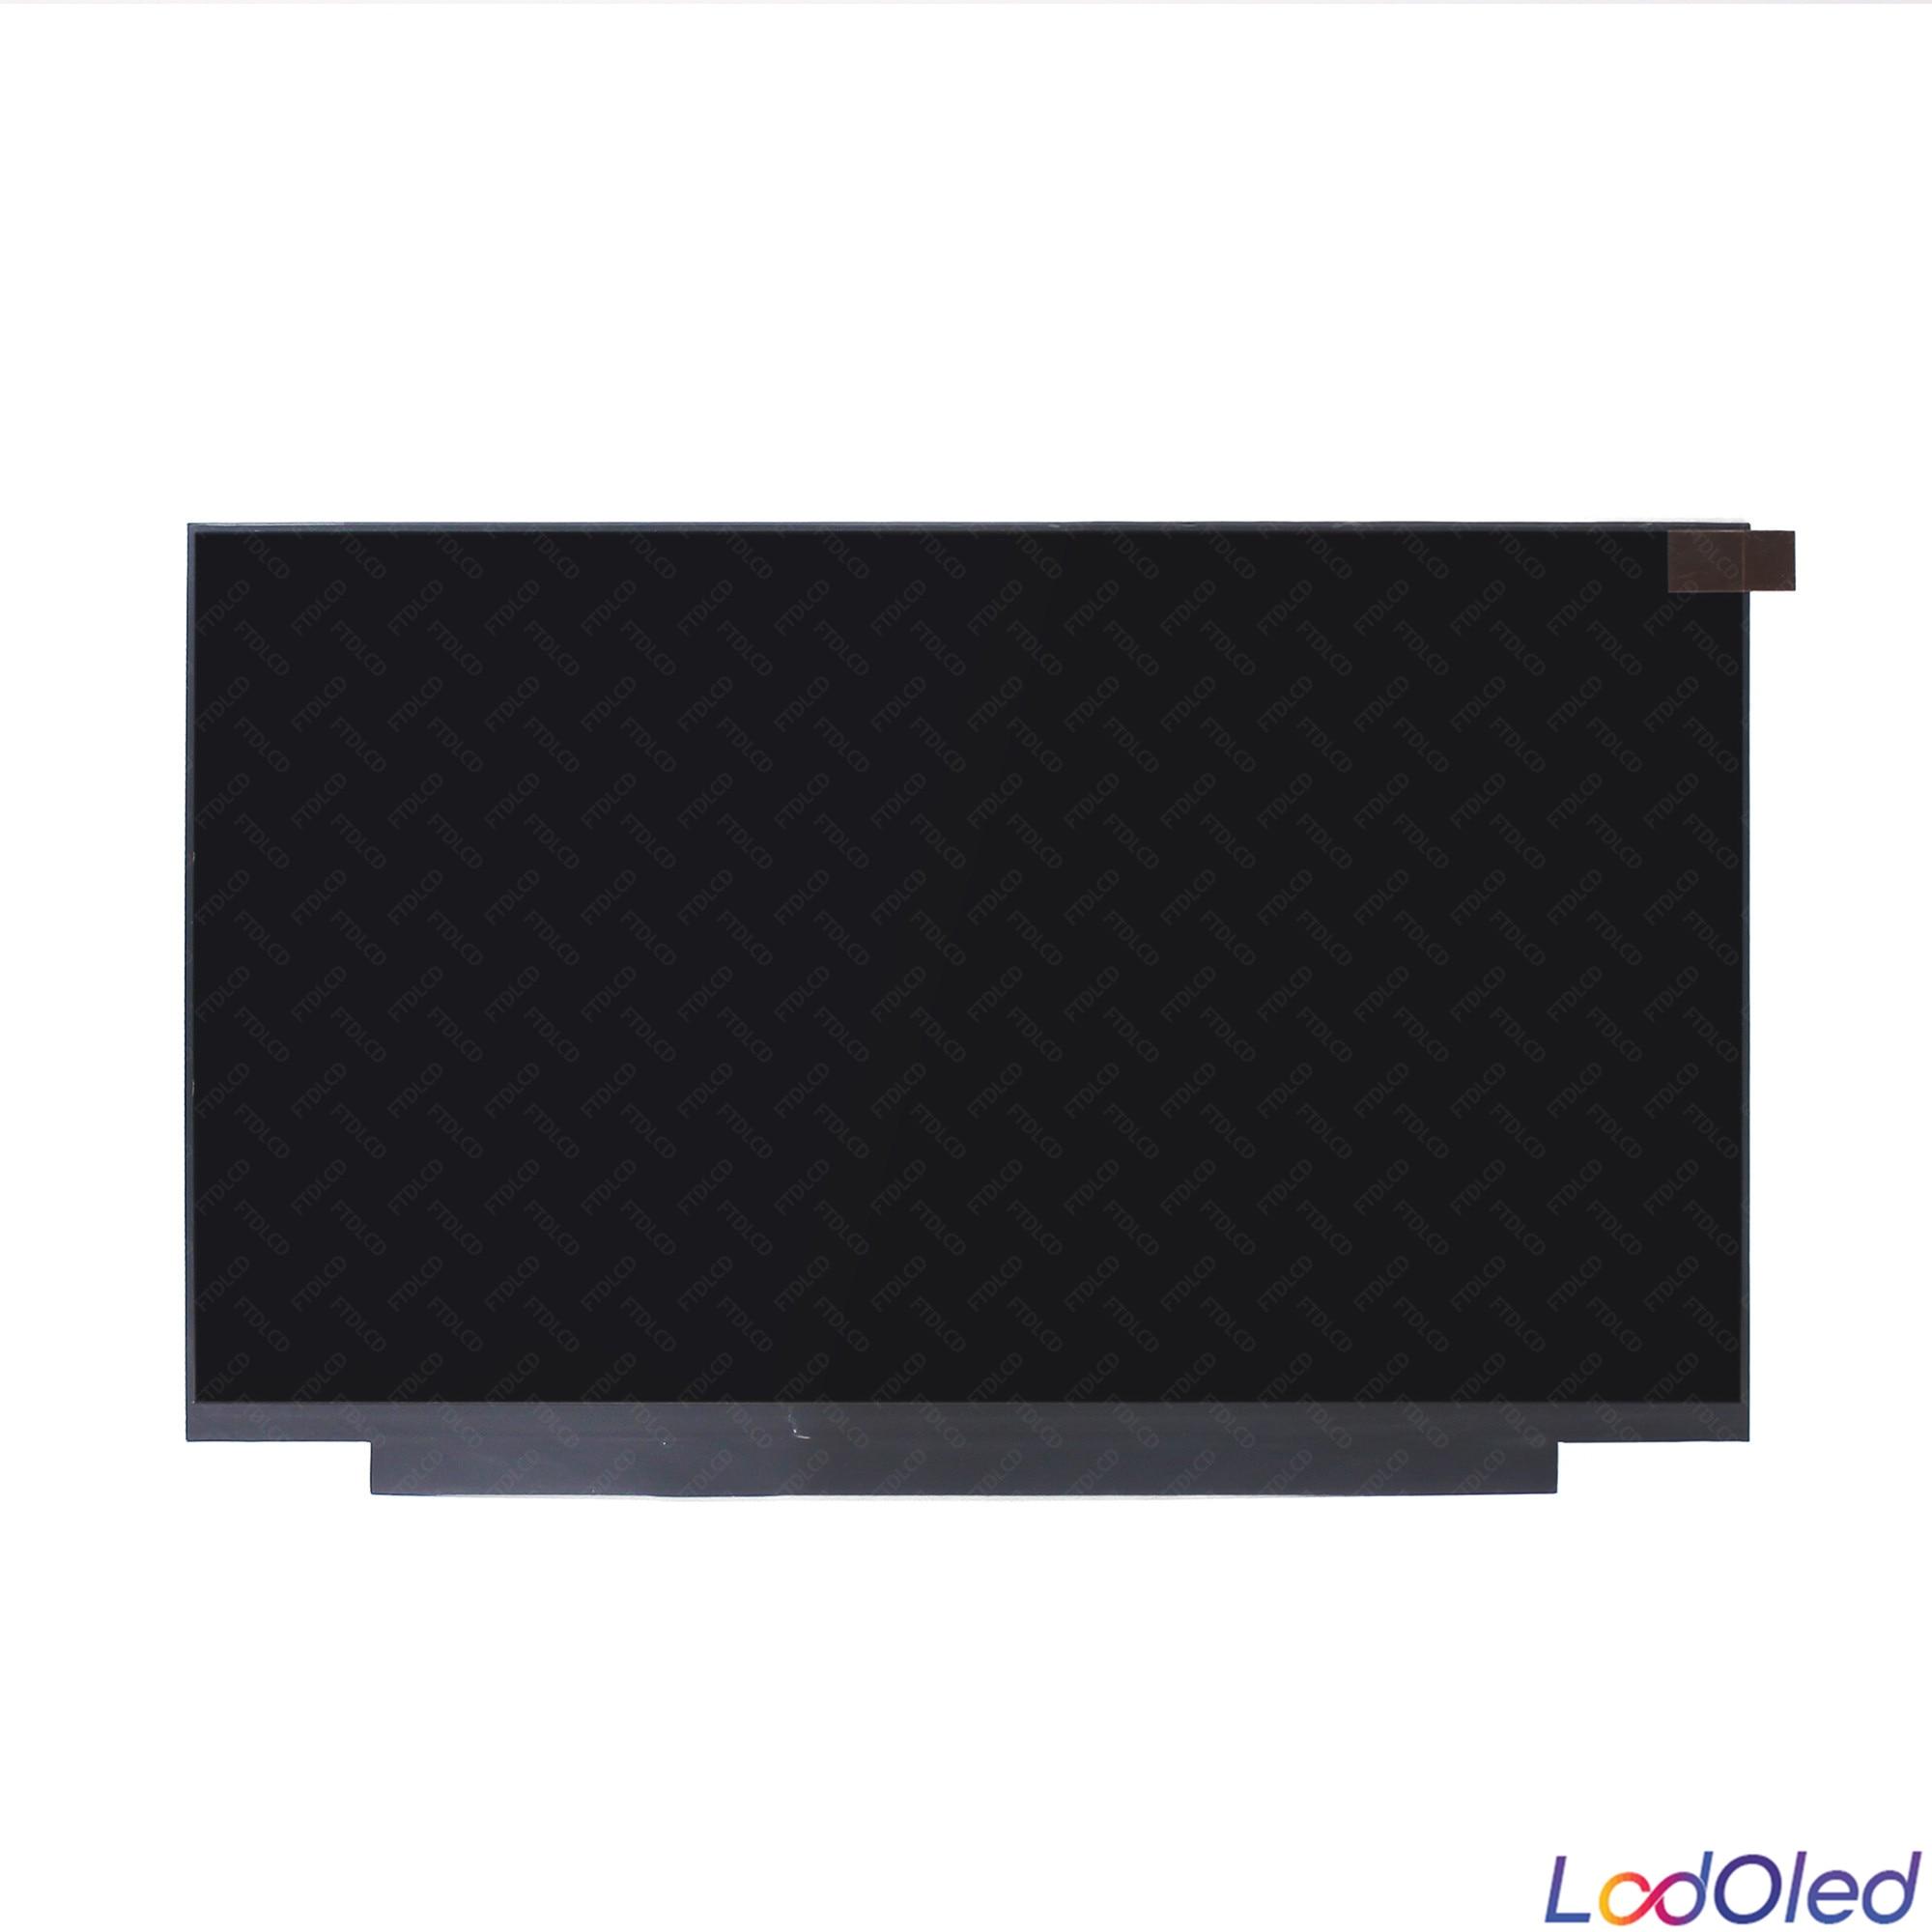 13.3 'HD LCD شاشة عرض LED لوحة مصفوفة NT133WHM-N47 B133XTN03.0 B133XTN03.3 M133NWR9 R1 N133BGA-EA2 5D10W46483 غير اللمس